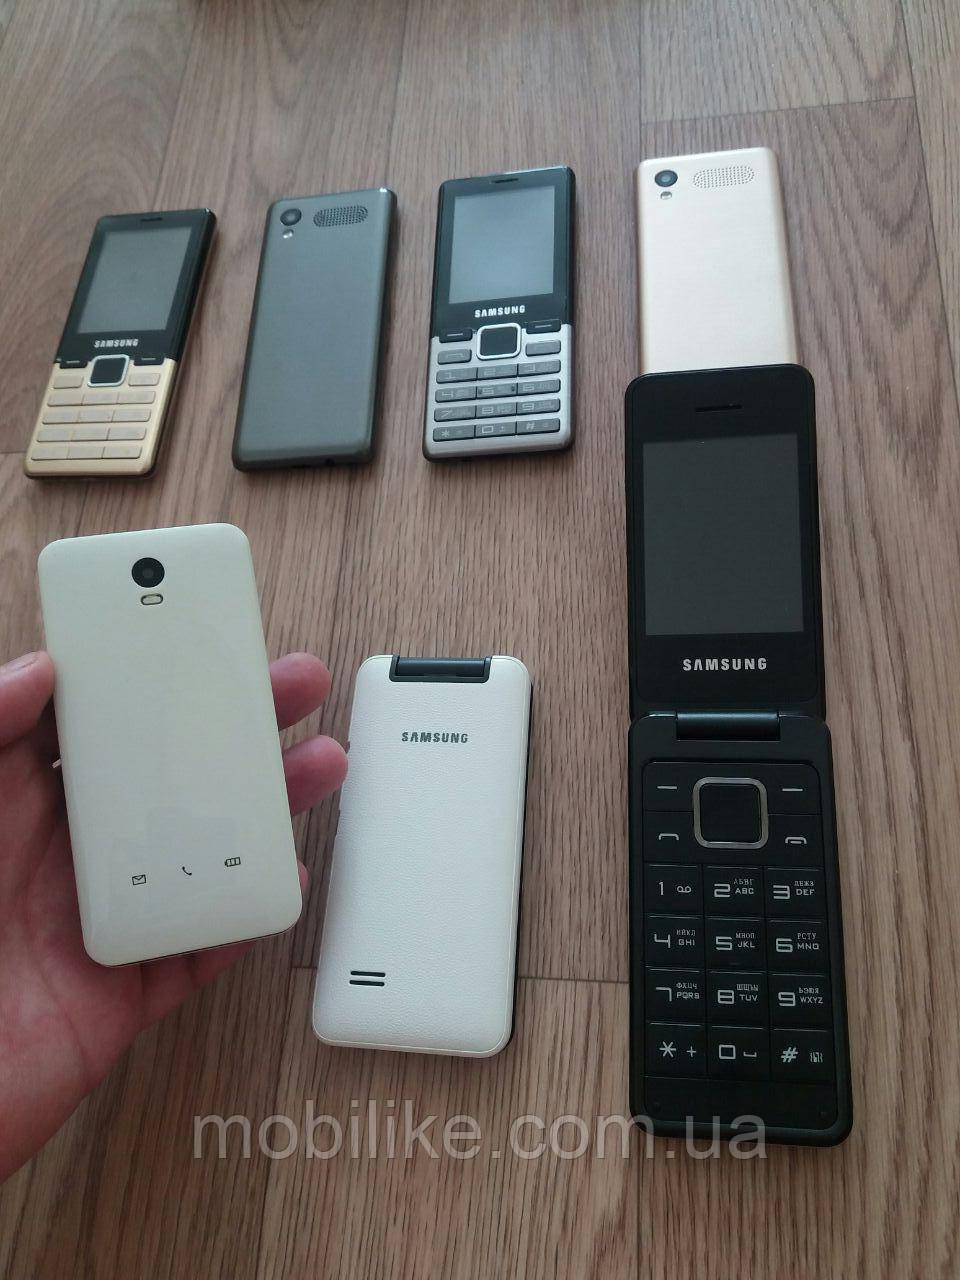 f02244ceae5e7 Кнопочный телефон Samsung D3 2 Sim, цена 1 250 грн., купить в Днепре —  Prom.ua (ID#792116078)